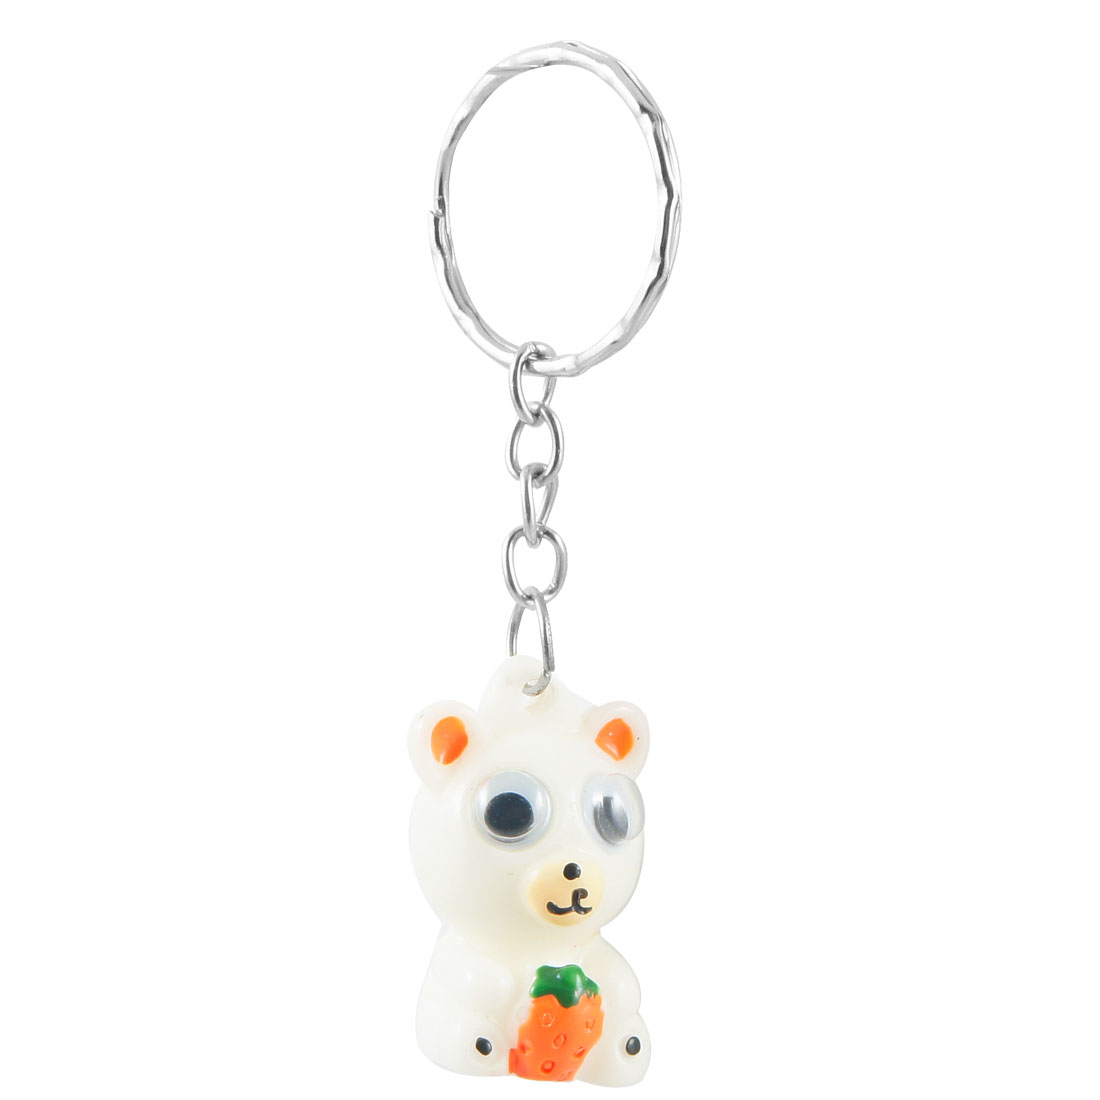 White Plastic Bear Pendant Key Ring Keychain Hanging Ornament